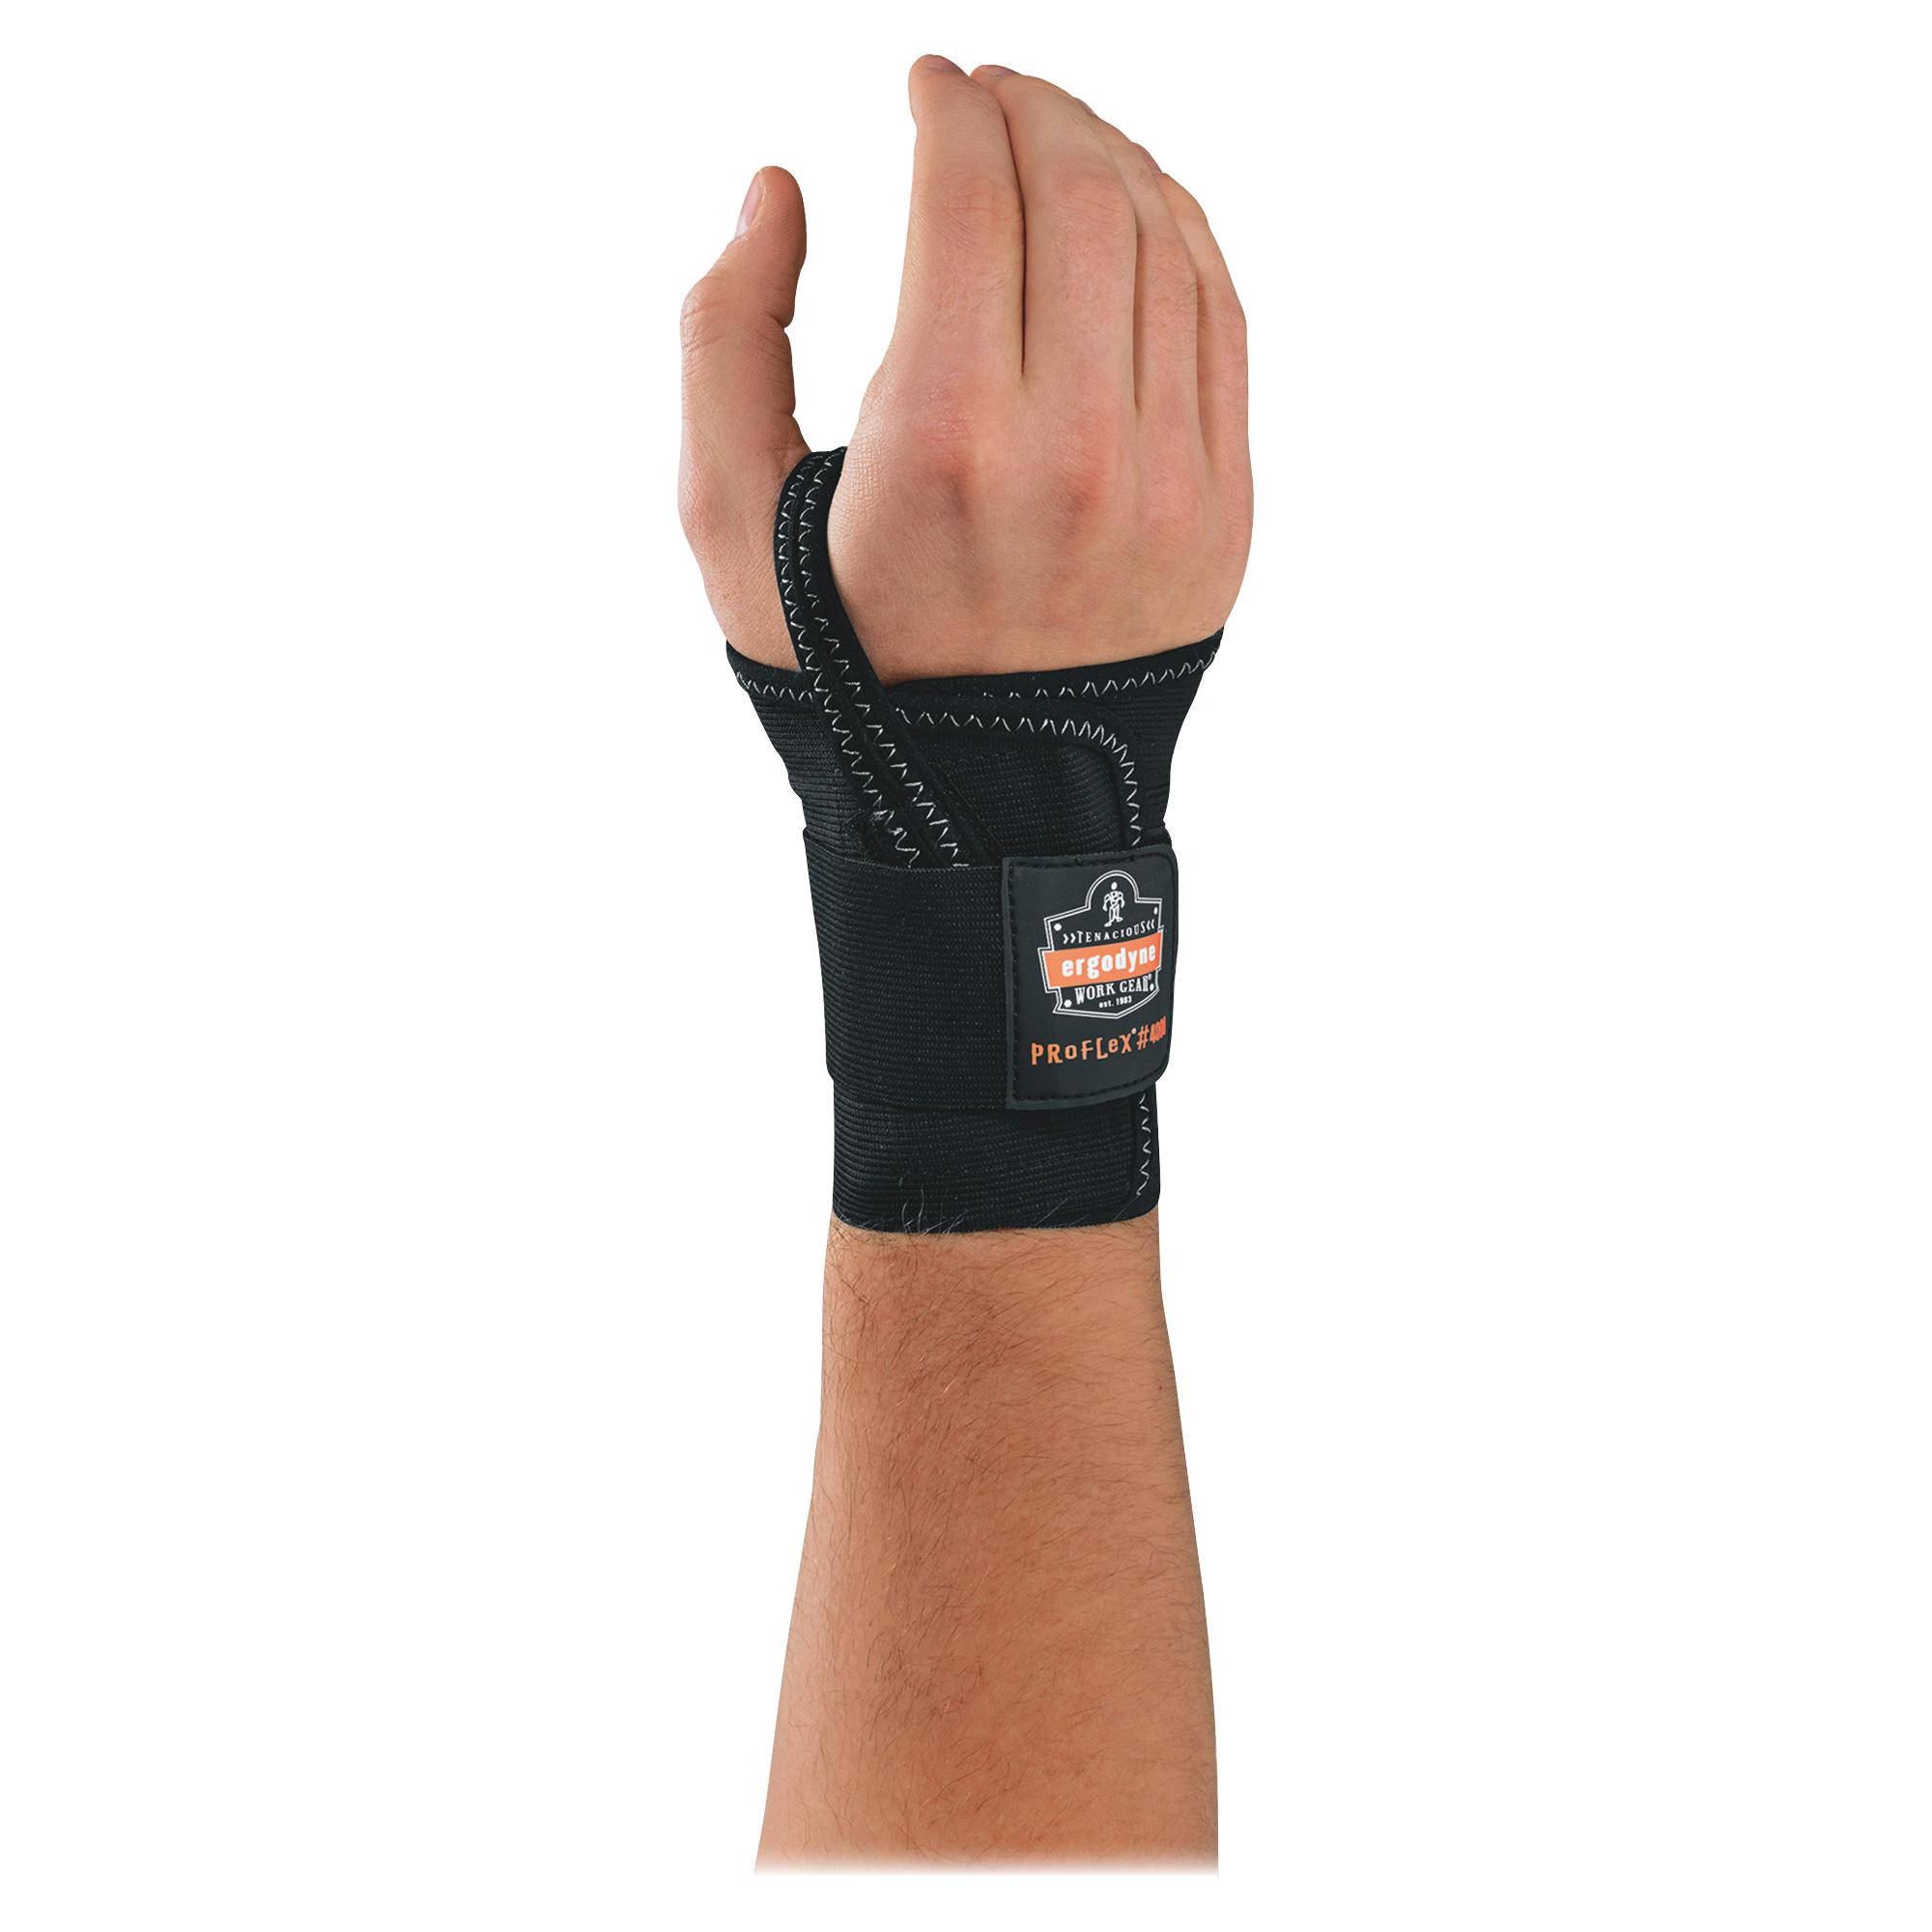 ergodyne ProFlex 4000 Wrist Support, Left-Hand, Large (7-8